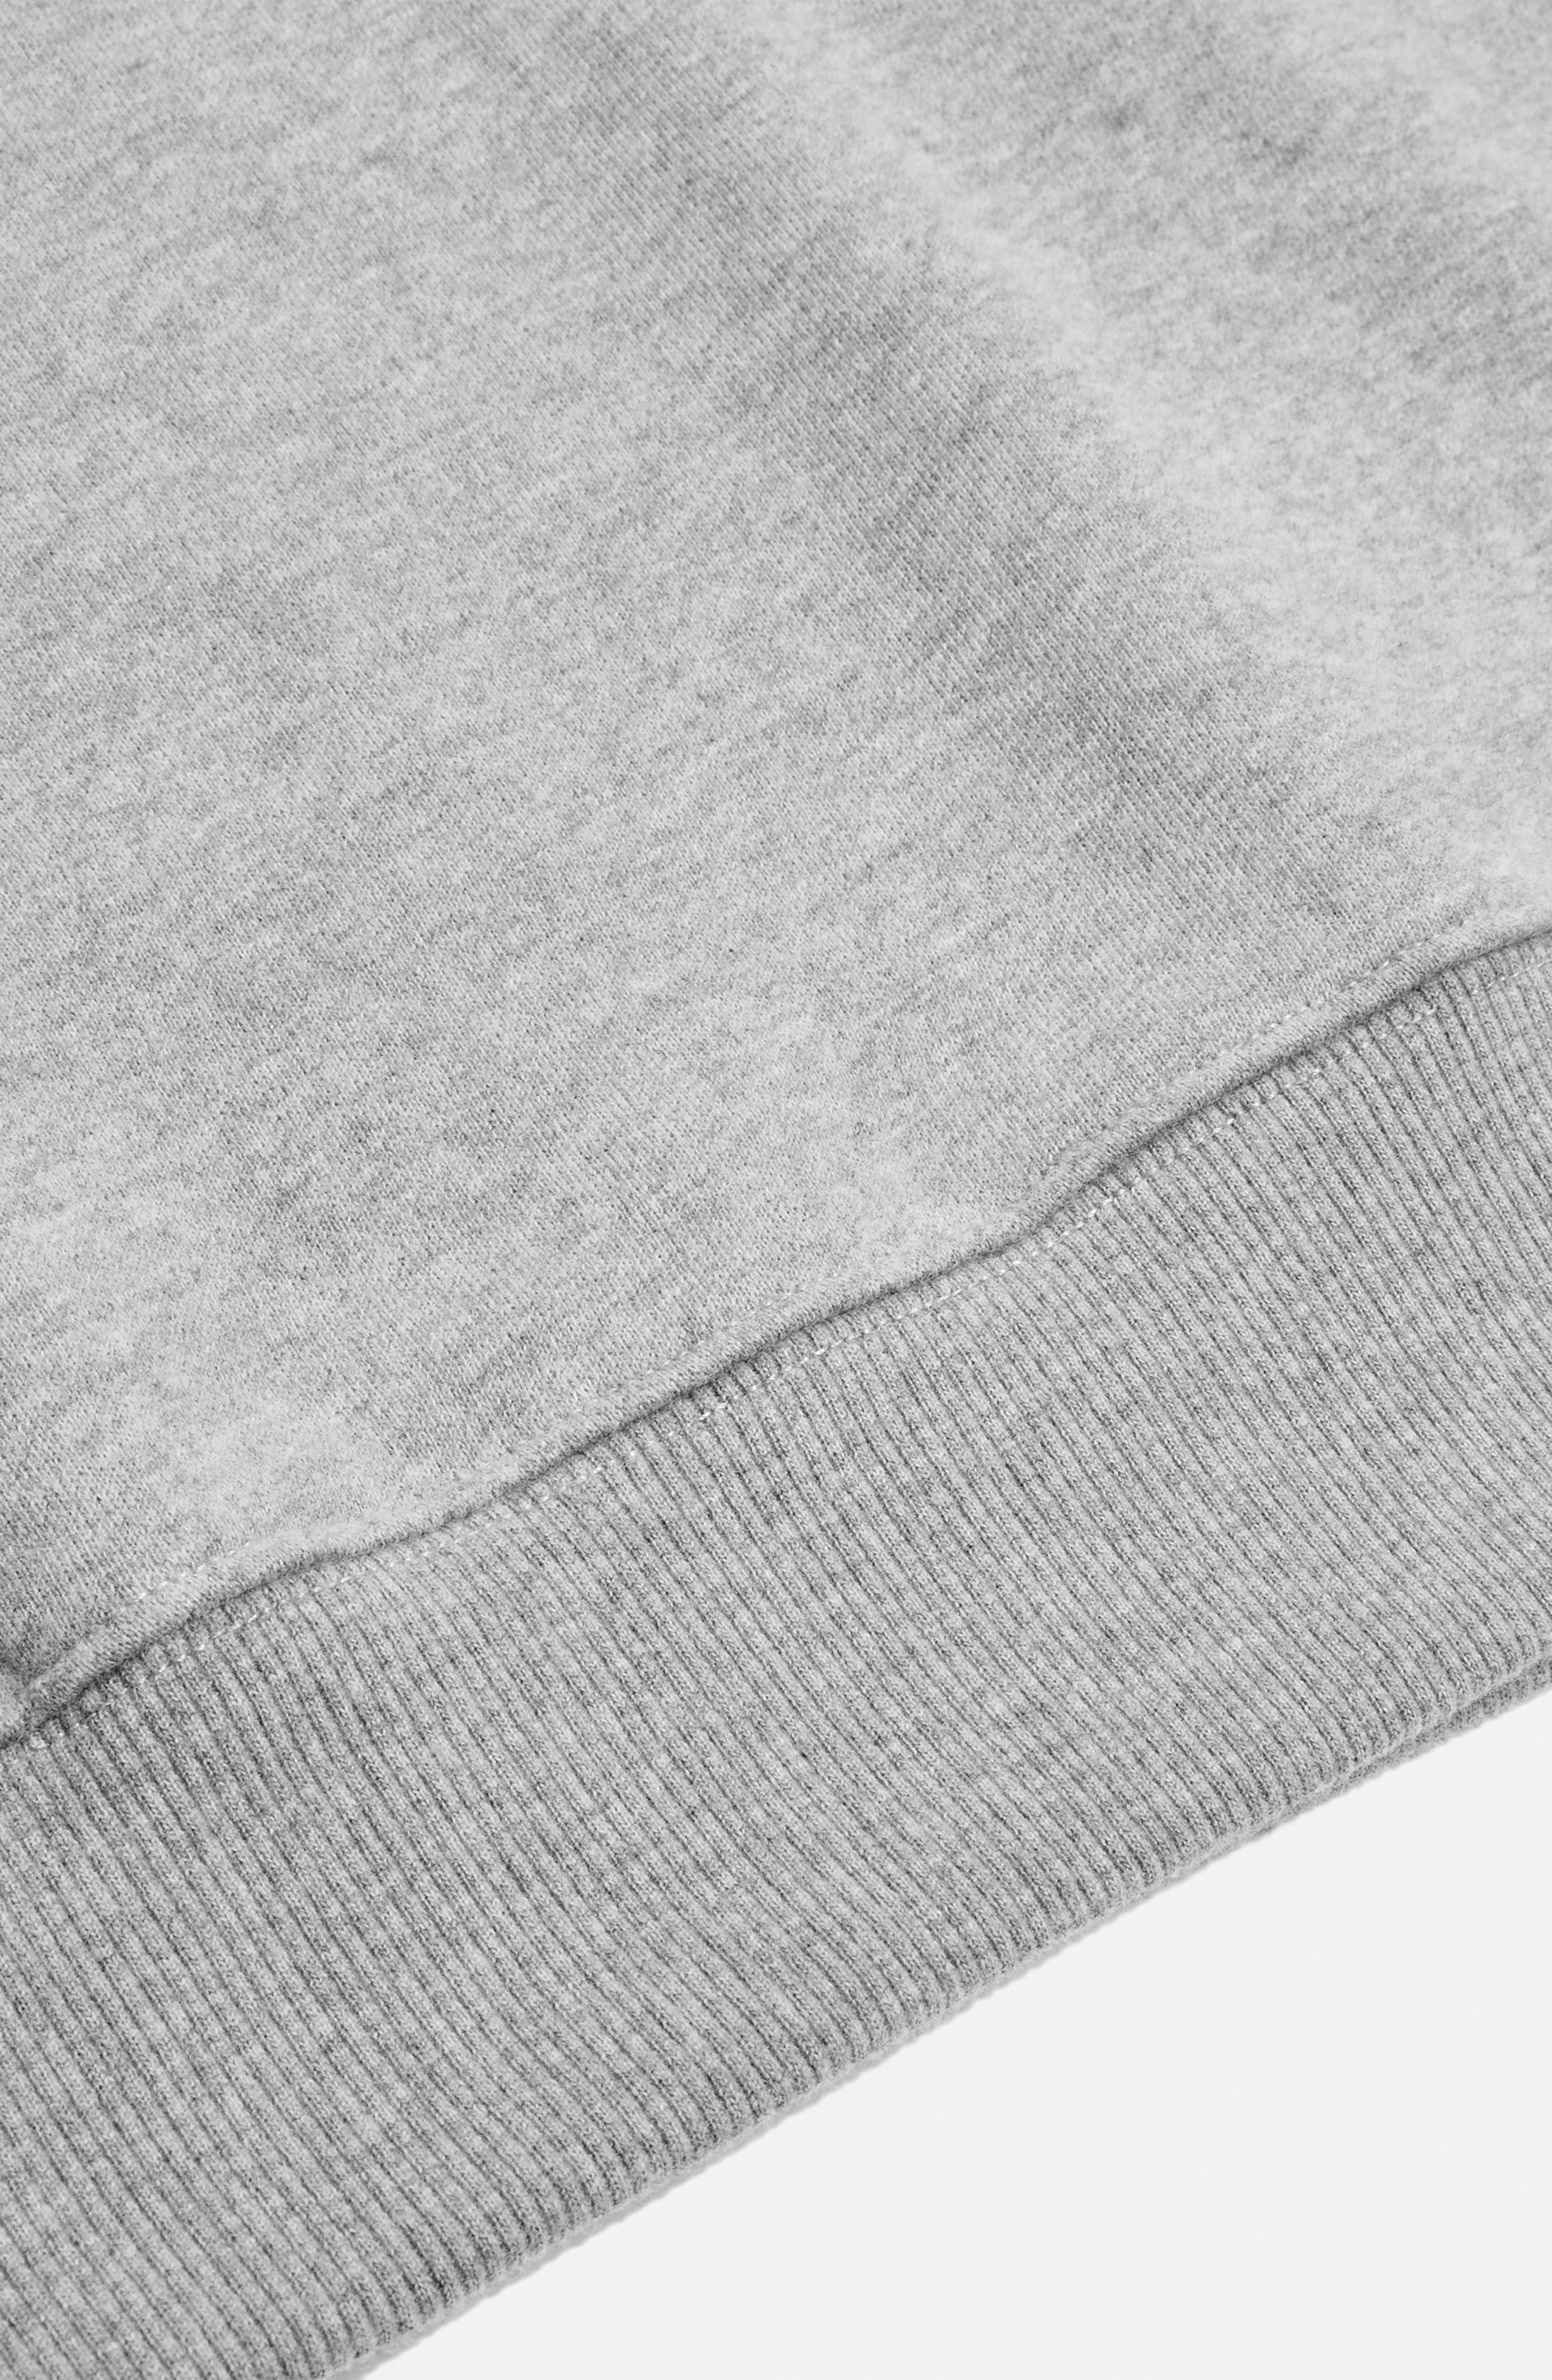 Oversize Sweatshirt,                             Alternate thumbnail 3, color,                             020